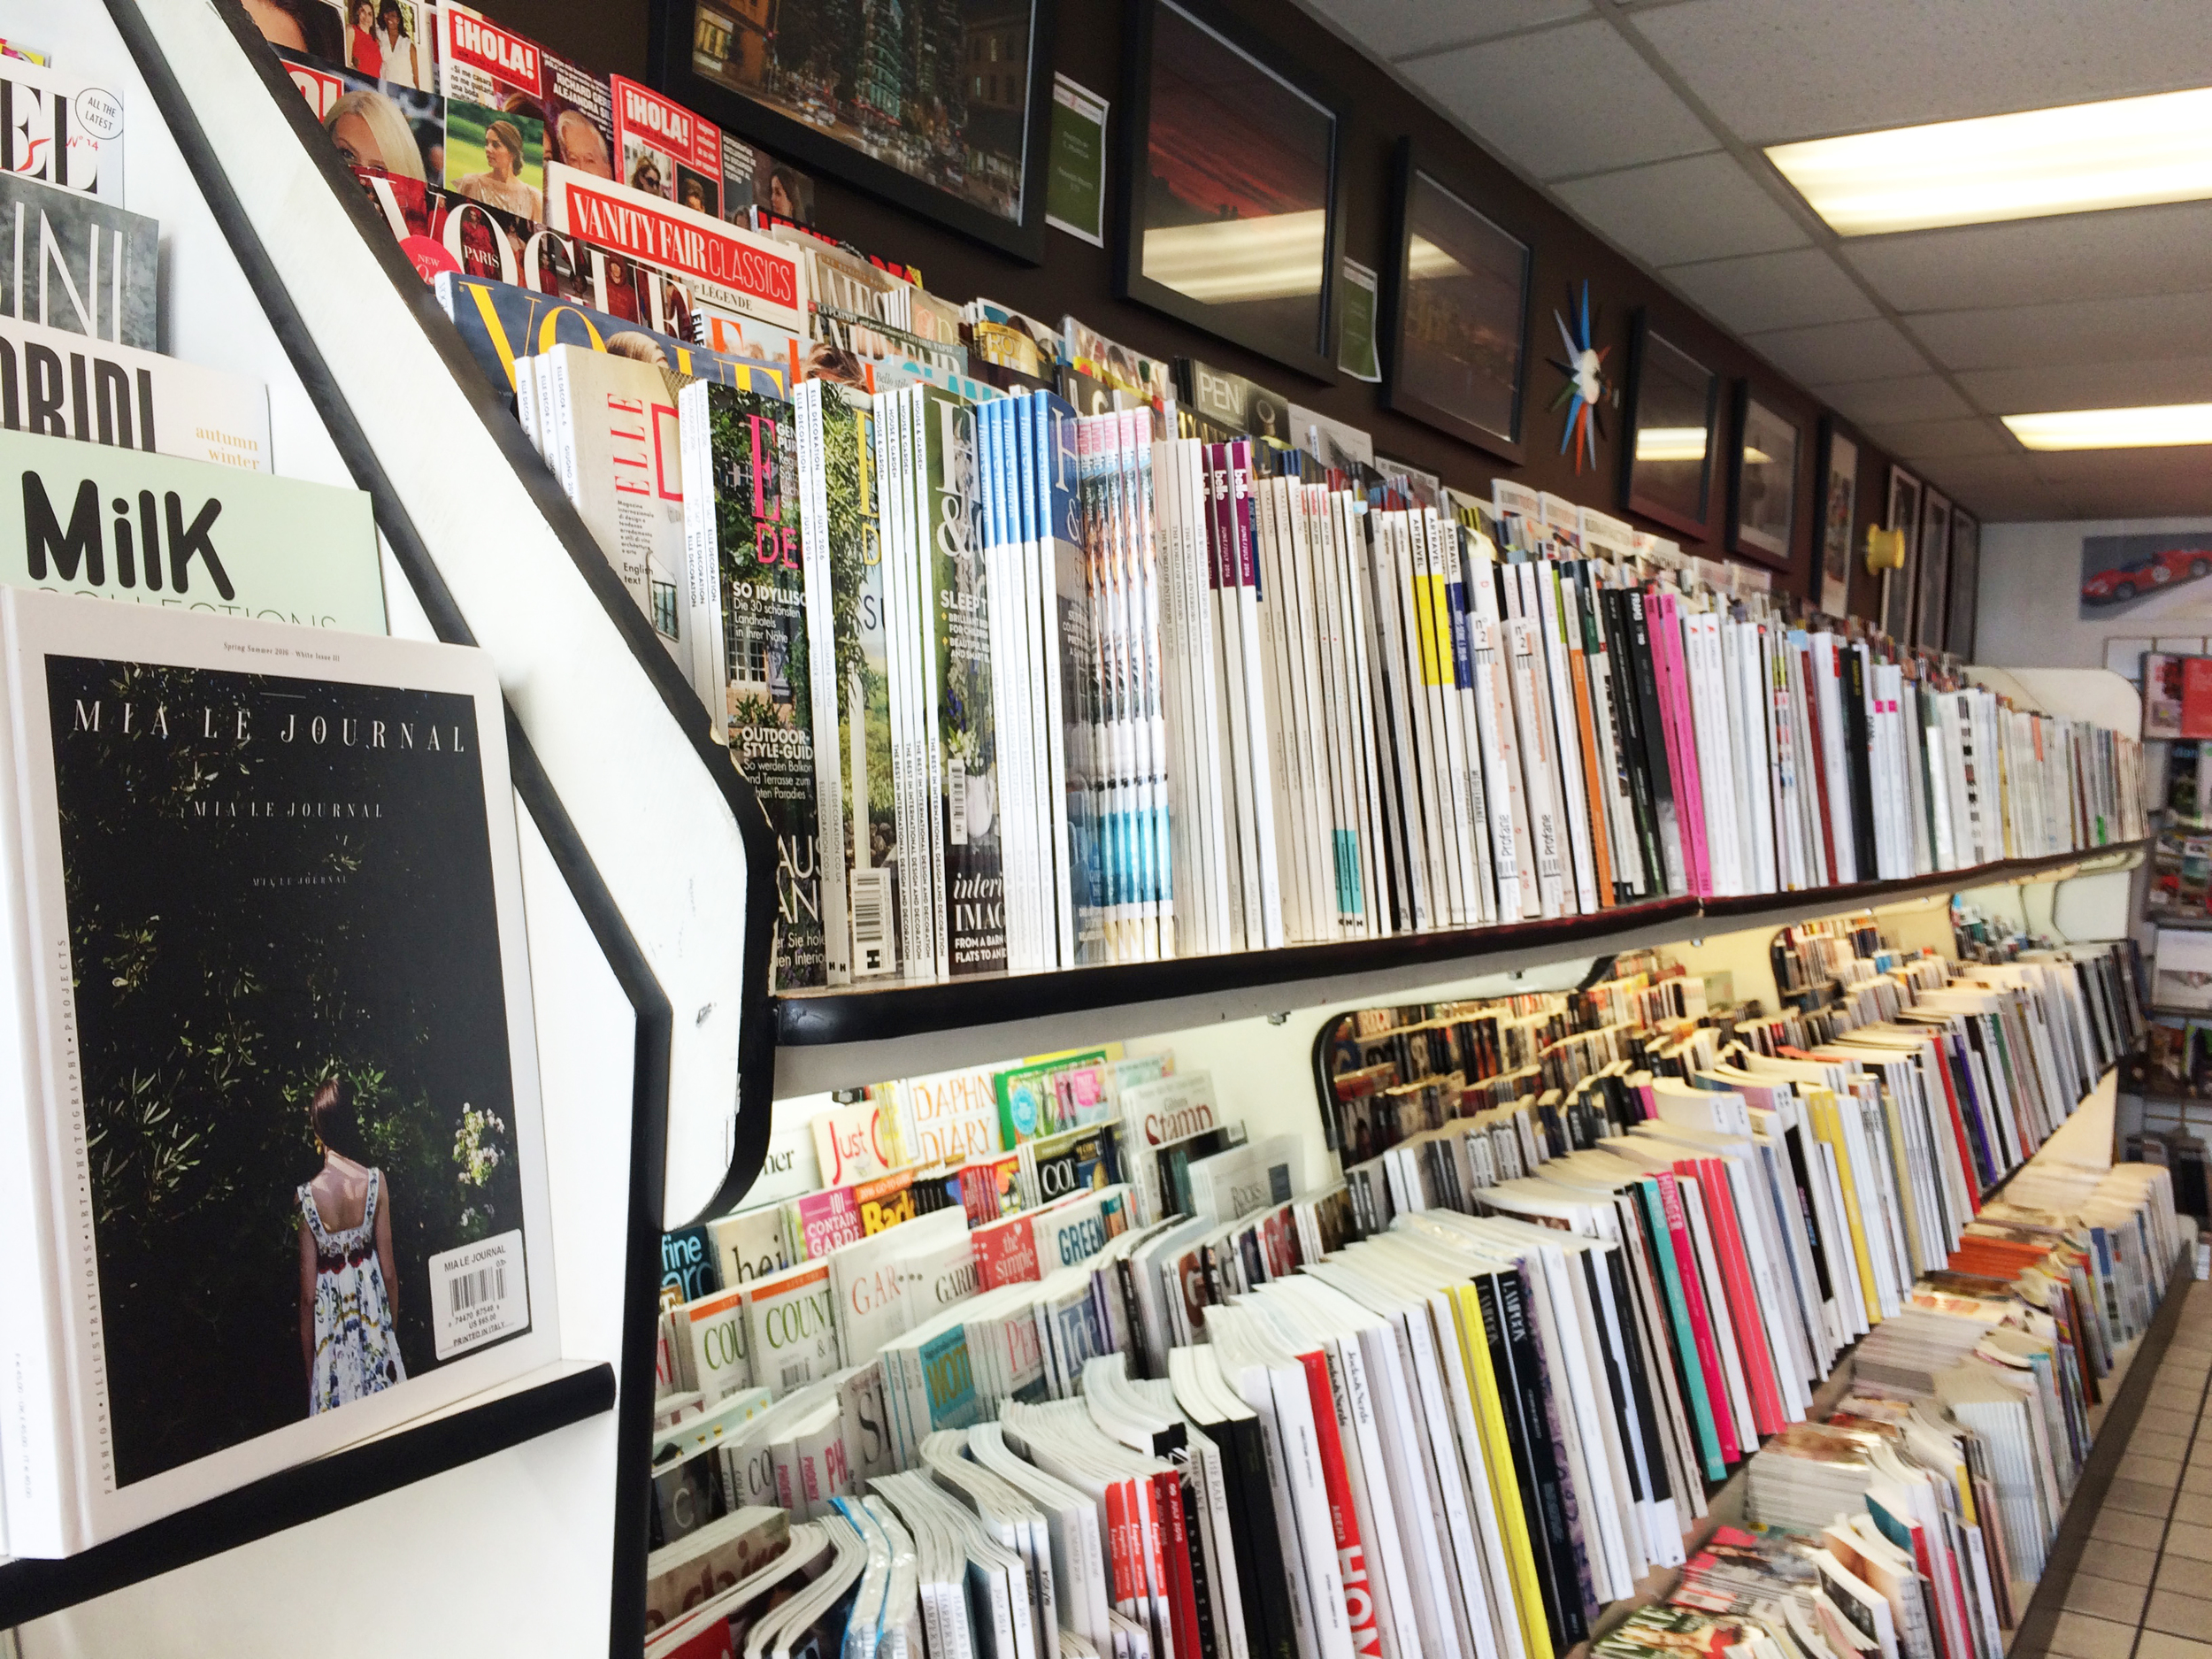 Magazines at Smoke Signals on Polk!